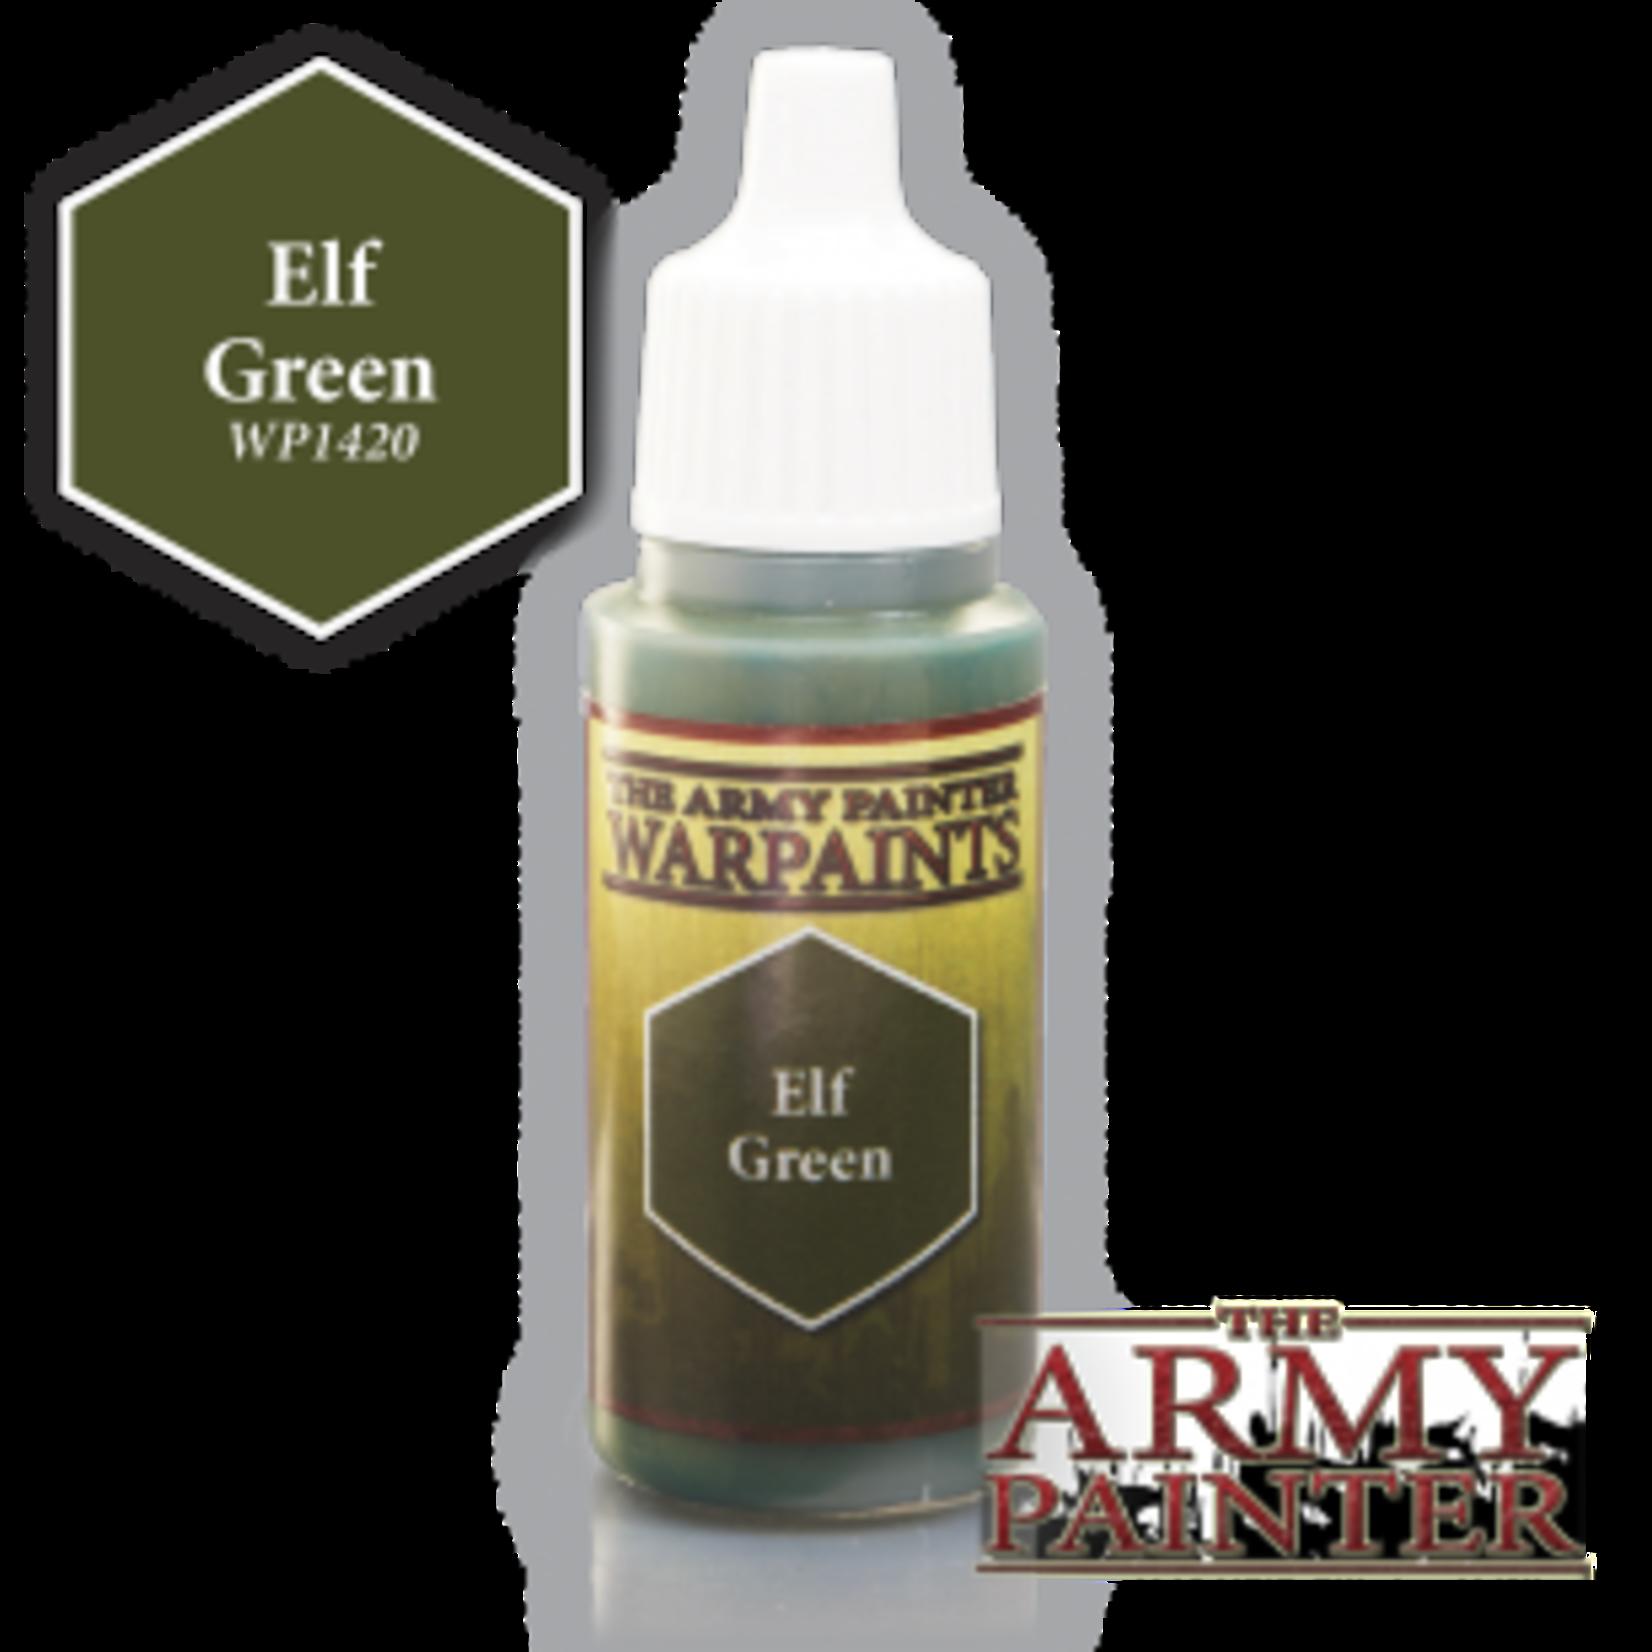 Army Painter APWP Elf Green 18ml